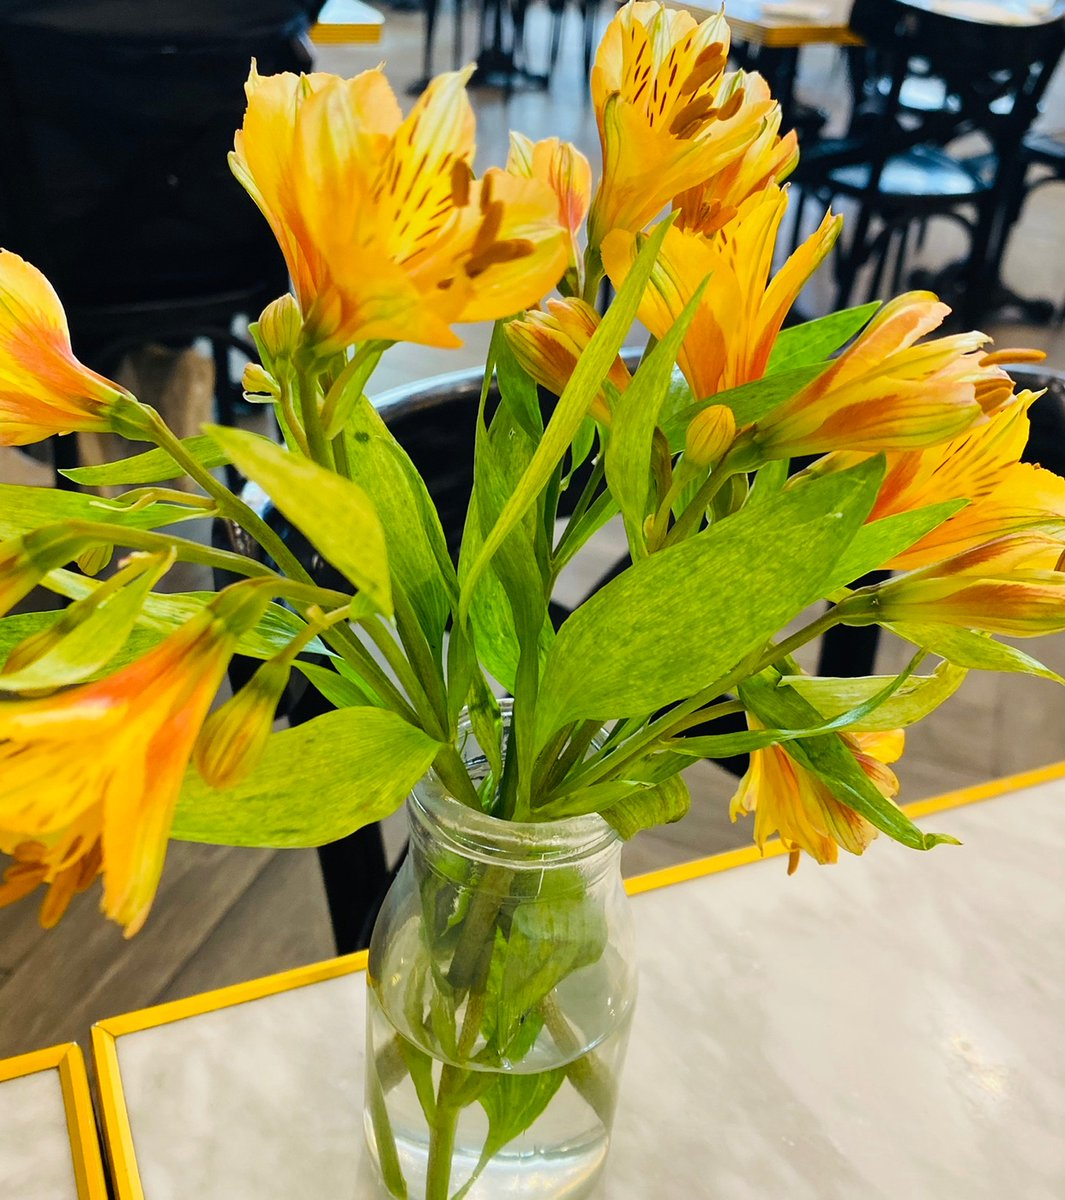 More flowerssssss!!!  #flowers #flores #colorfulpic.twitter.com/XewKmDOXMJ